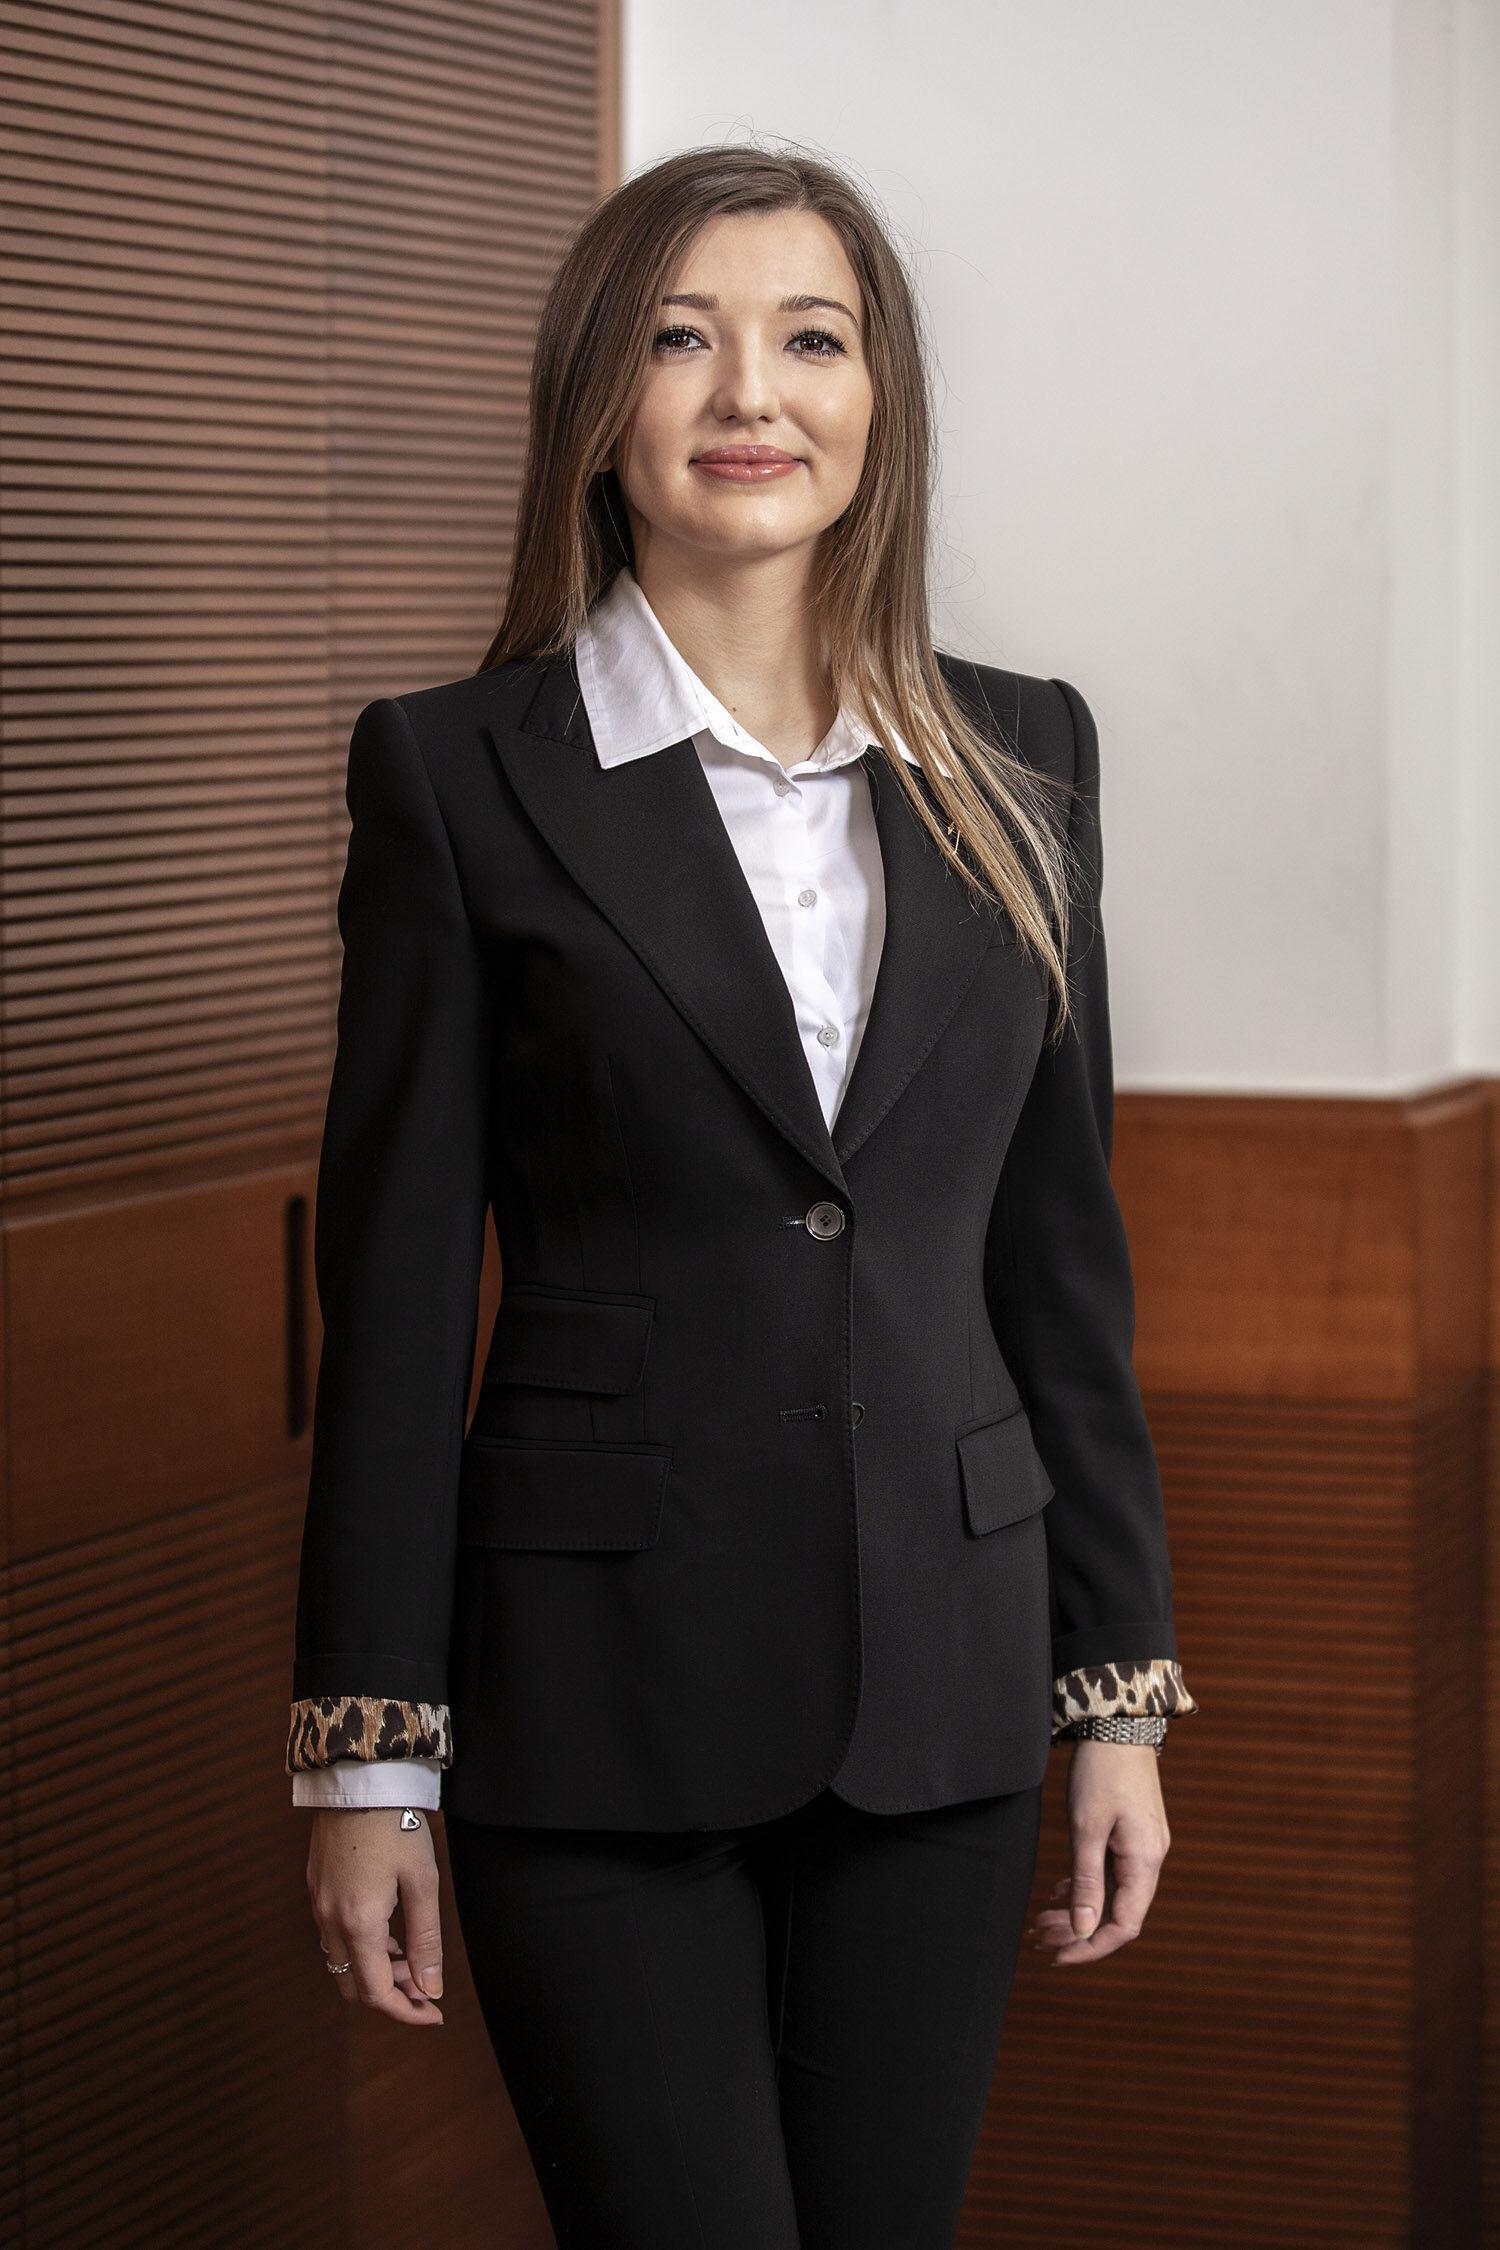 Wise Equity - Liudmyla Shyngera - Support Staff